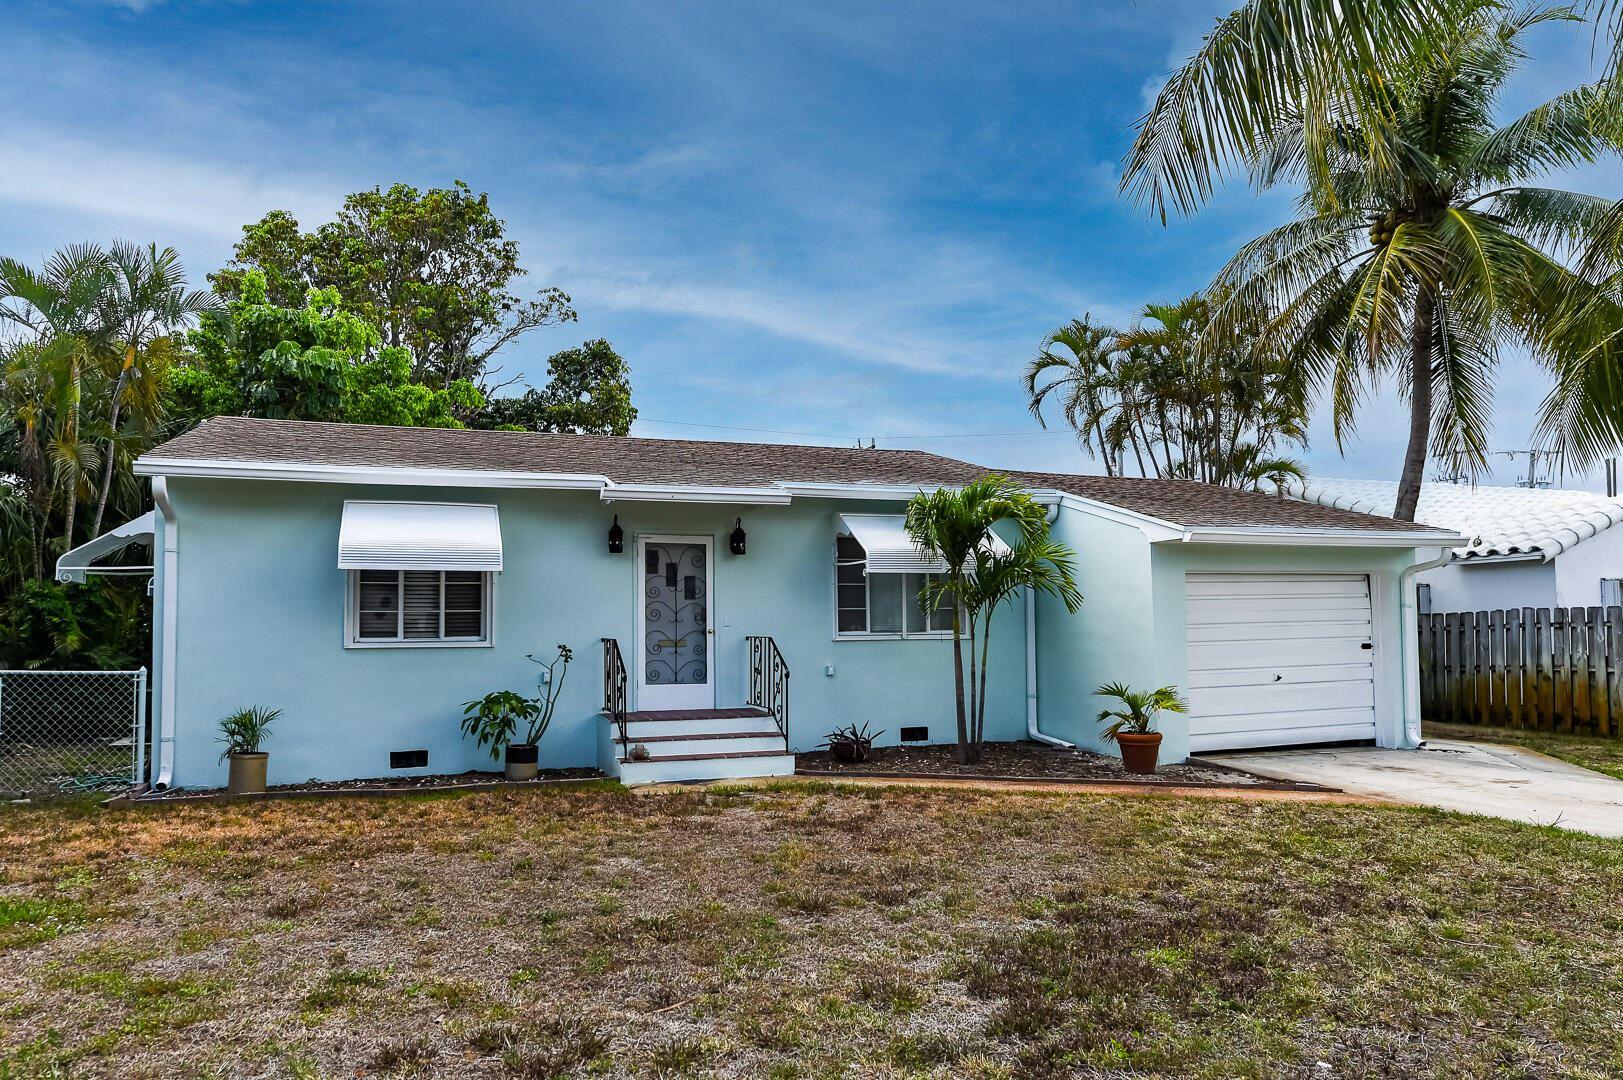 348 E Lakewood Road, West Palm Beach, FL 33405 - MLS#: RX-10710523